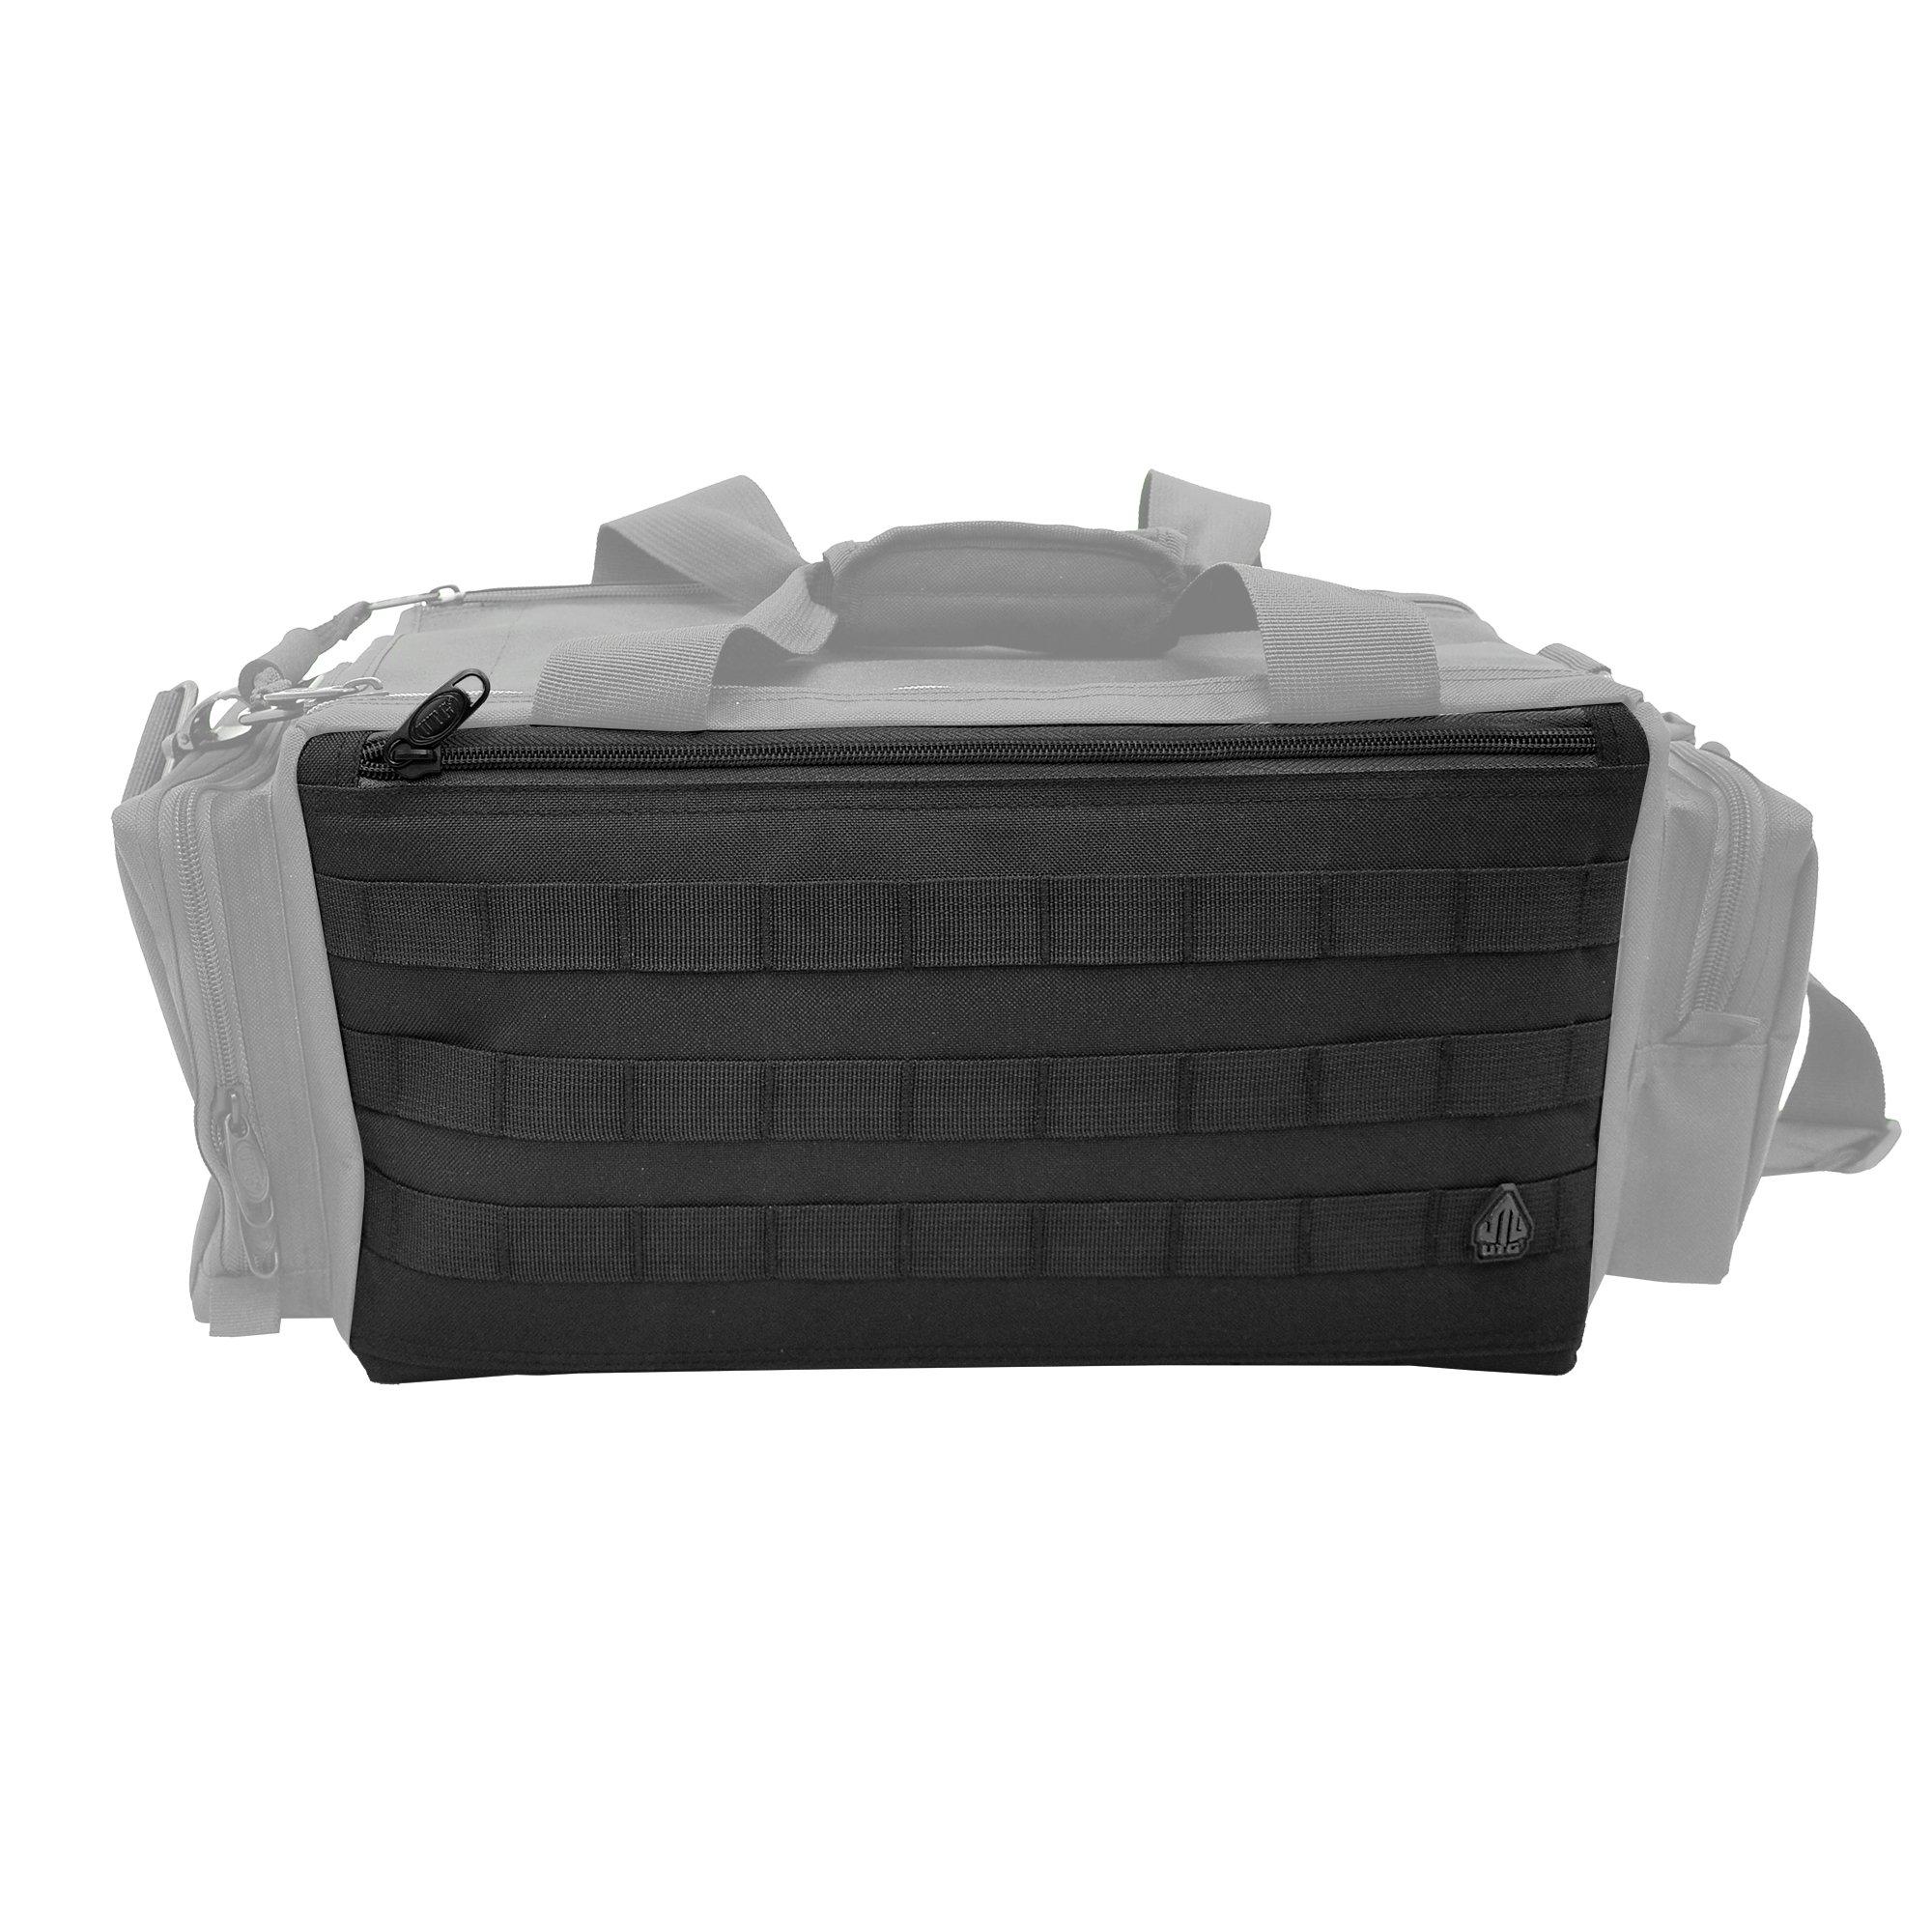 UTG All in One Range/Utility Go Bag, Black, 21'' x 10'' x 9'' by UTG (Image #10)